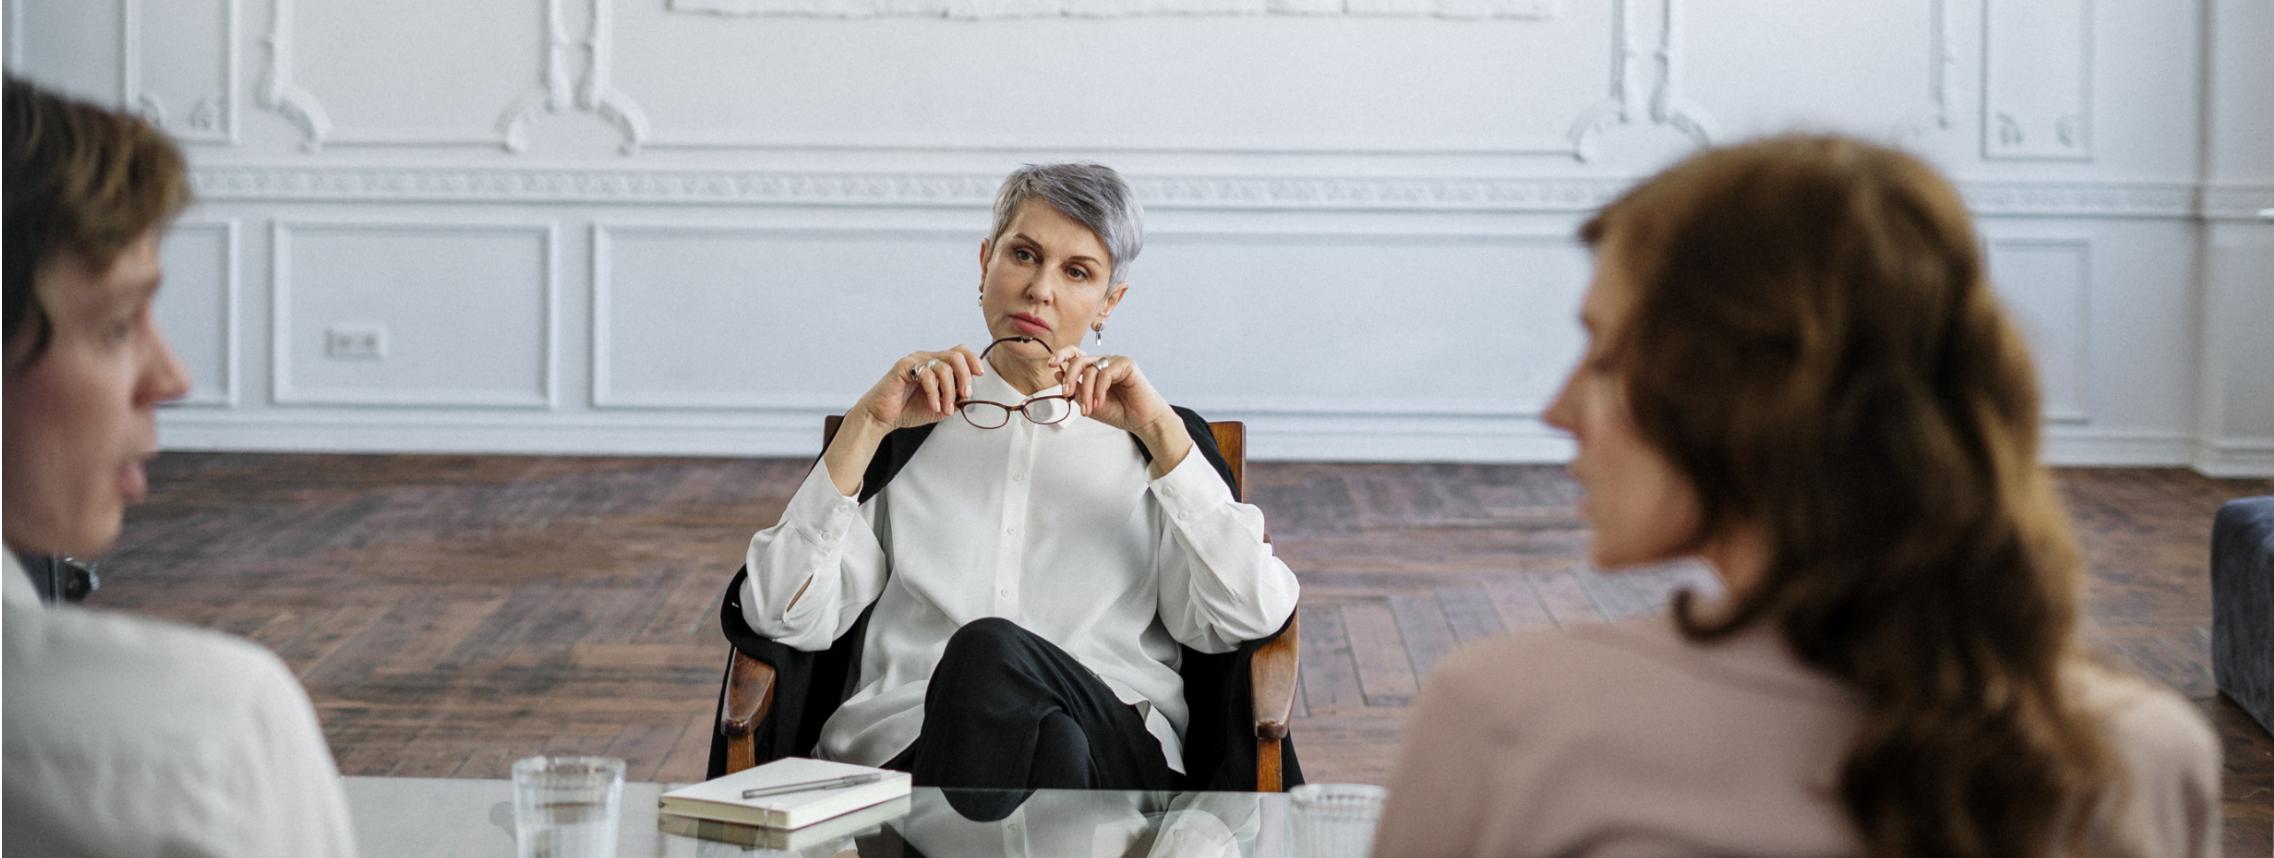 Psychologist Failure to Meet Minimum Performance tandards